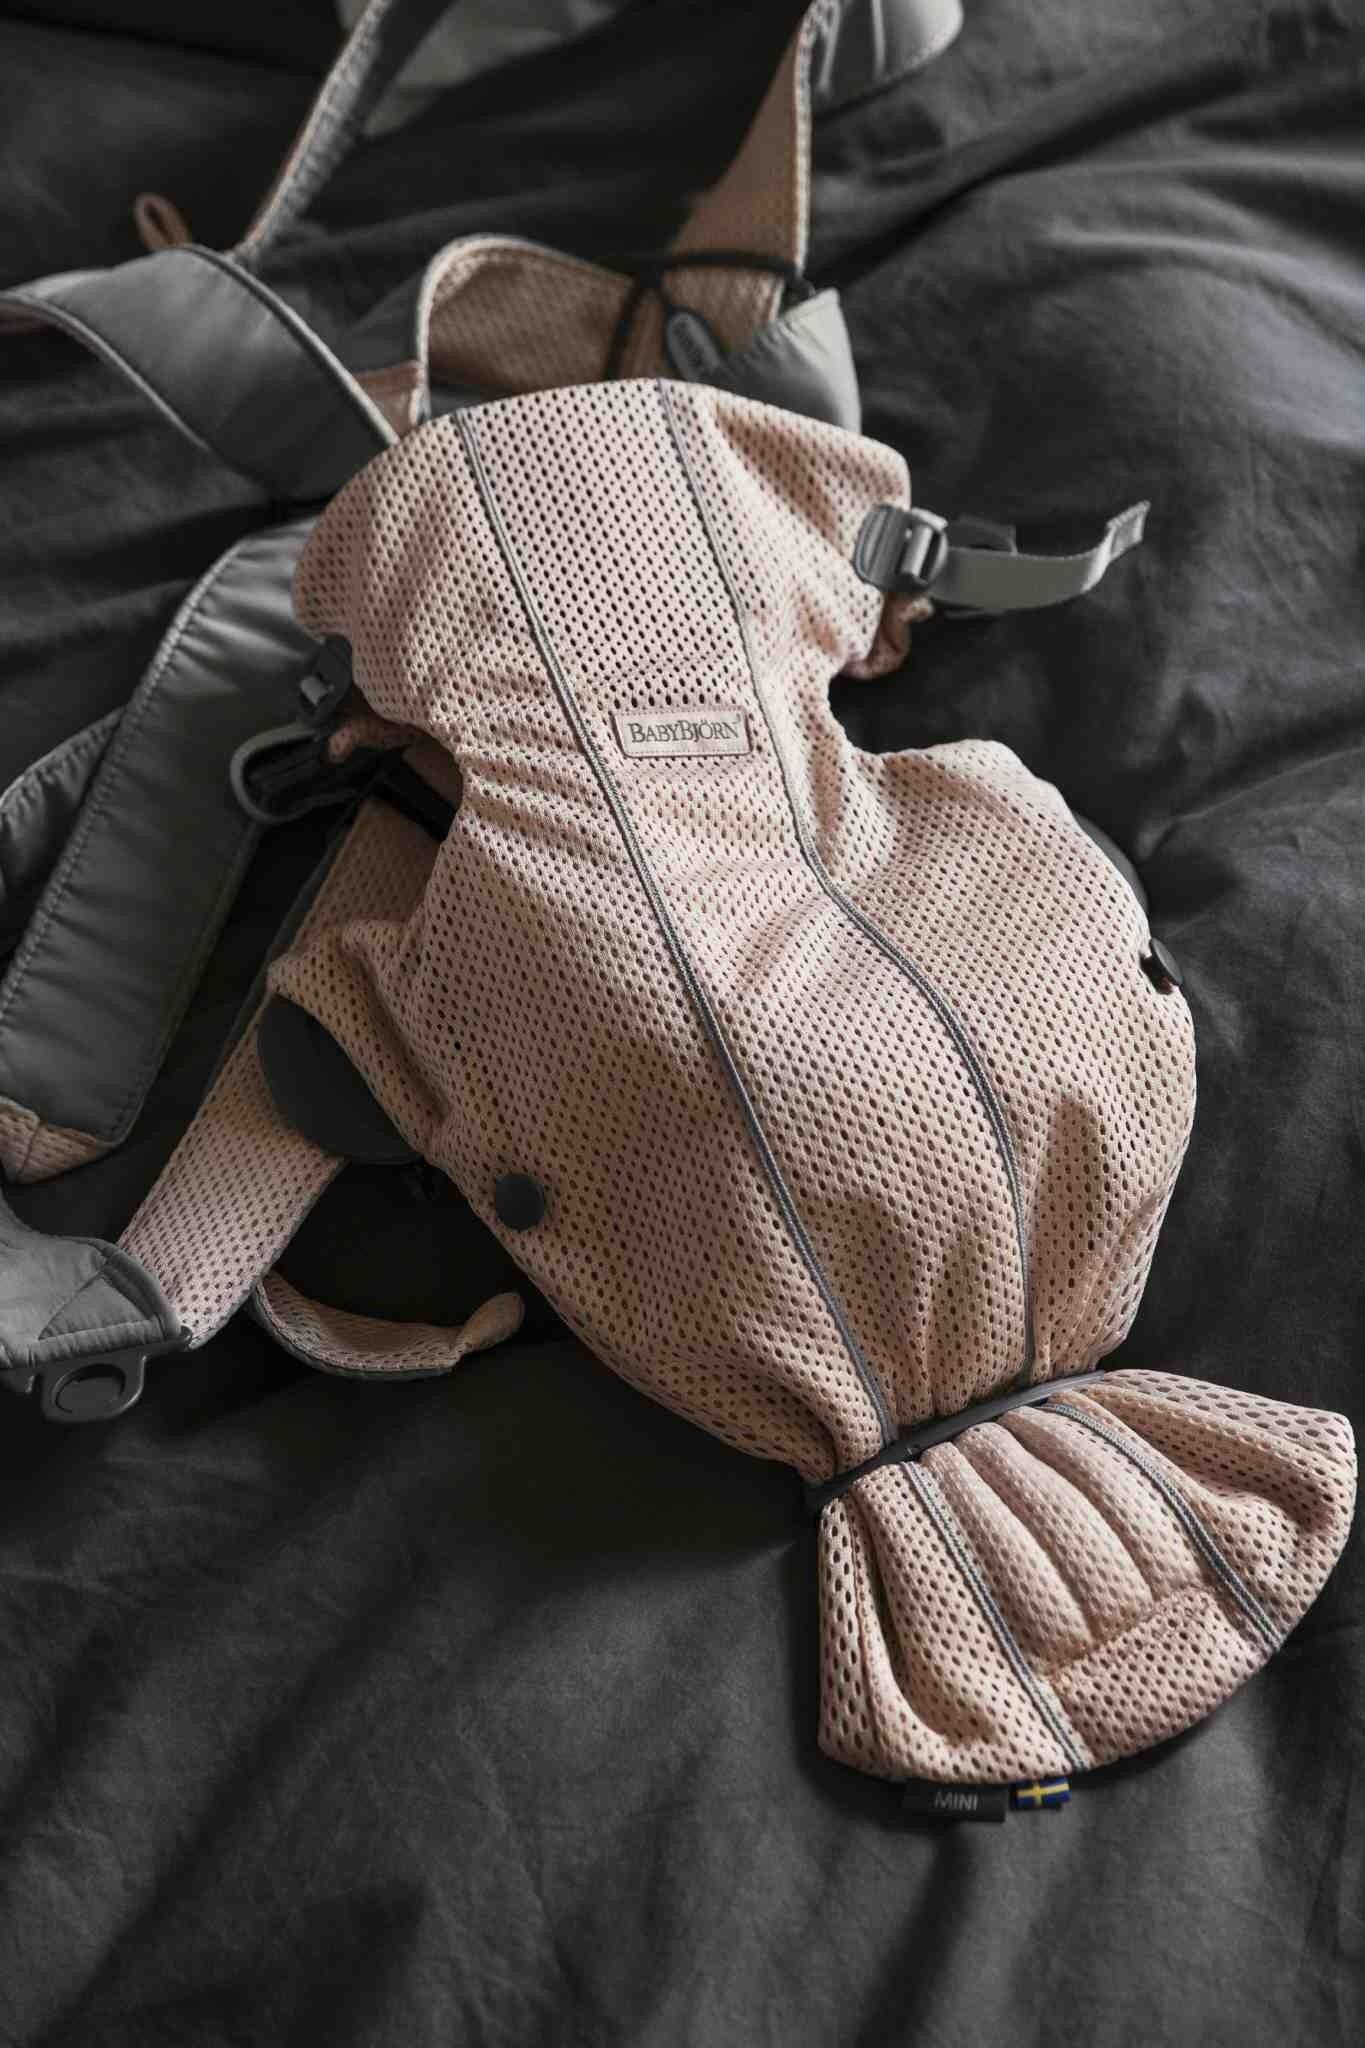 BABYBJORN MINI 3D Mesh – nosidełko, Perłowy Różowy